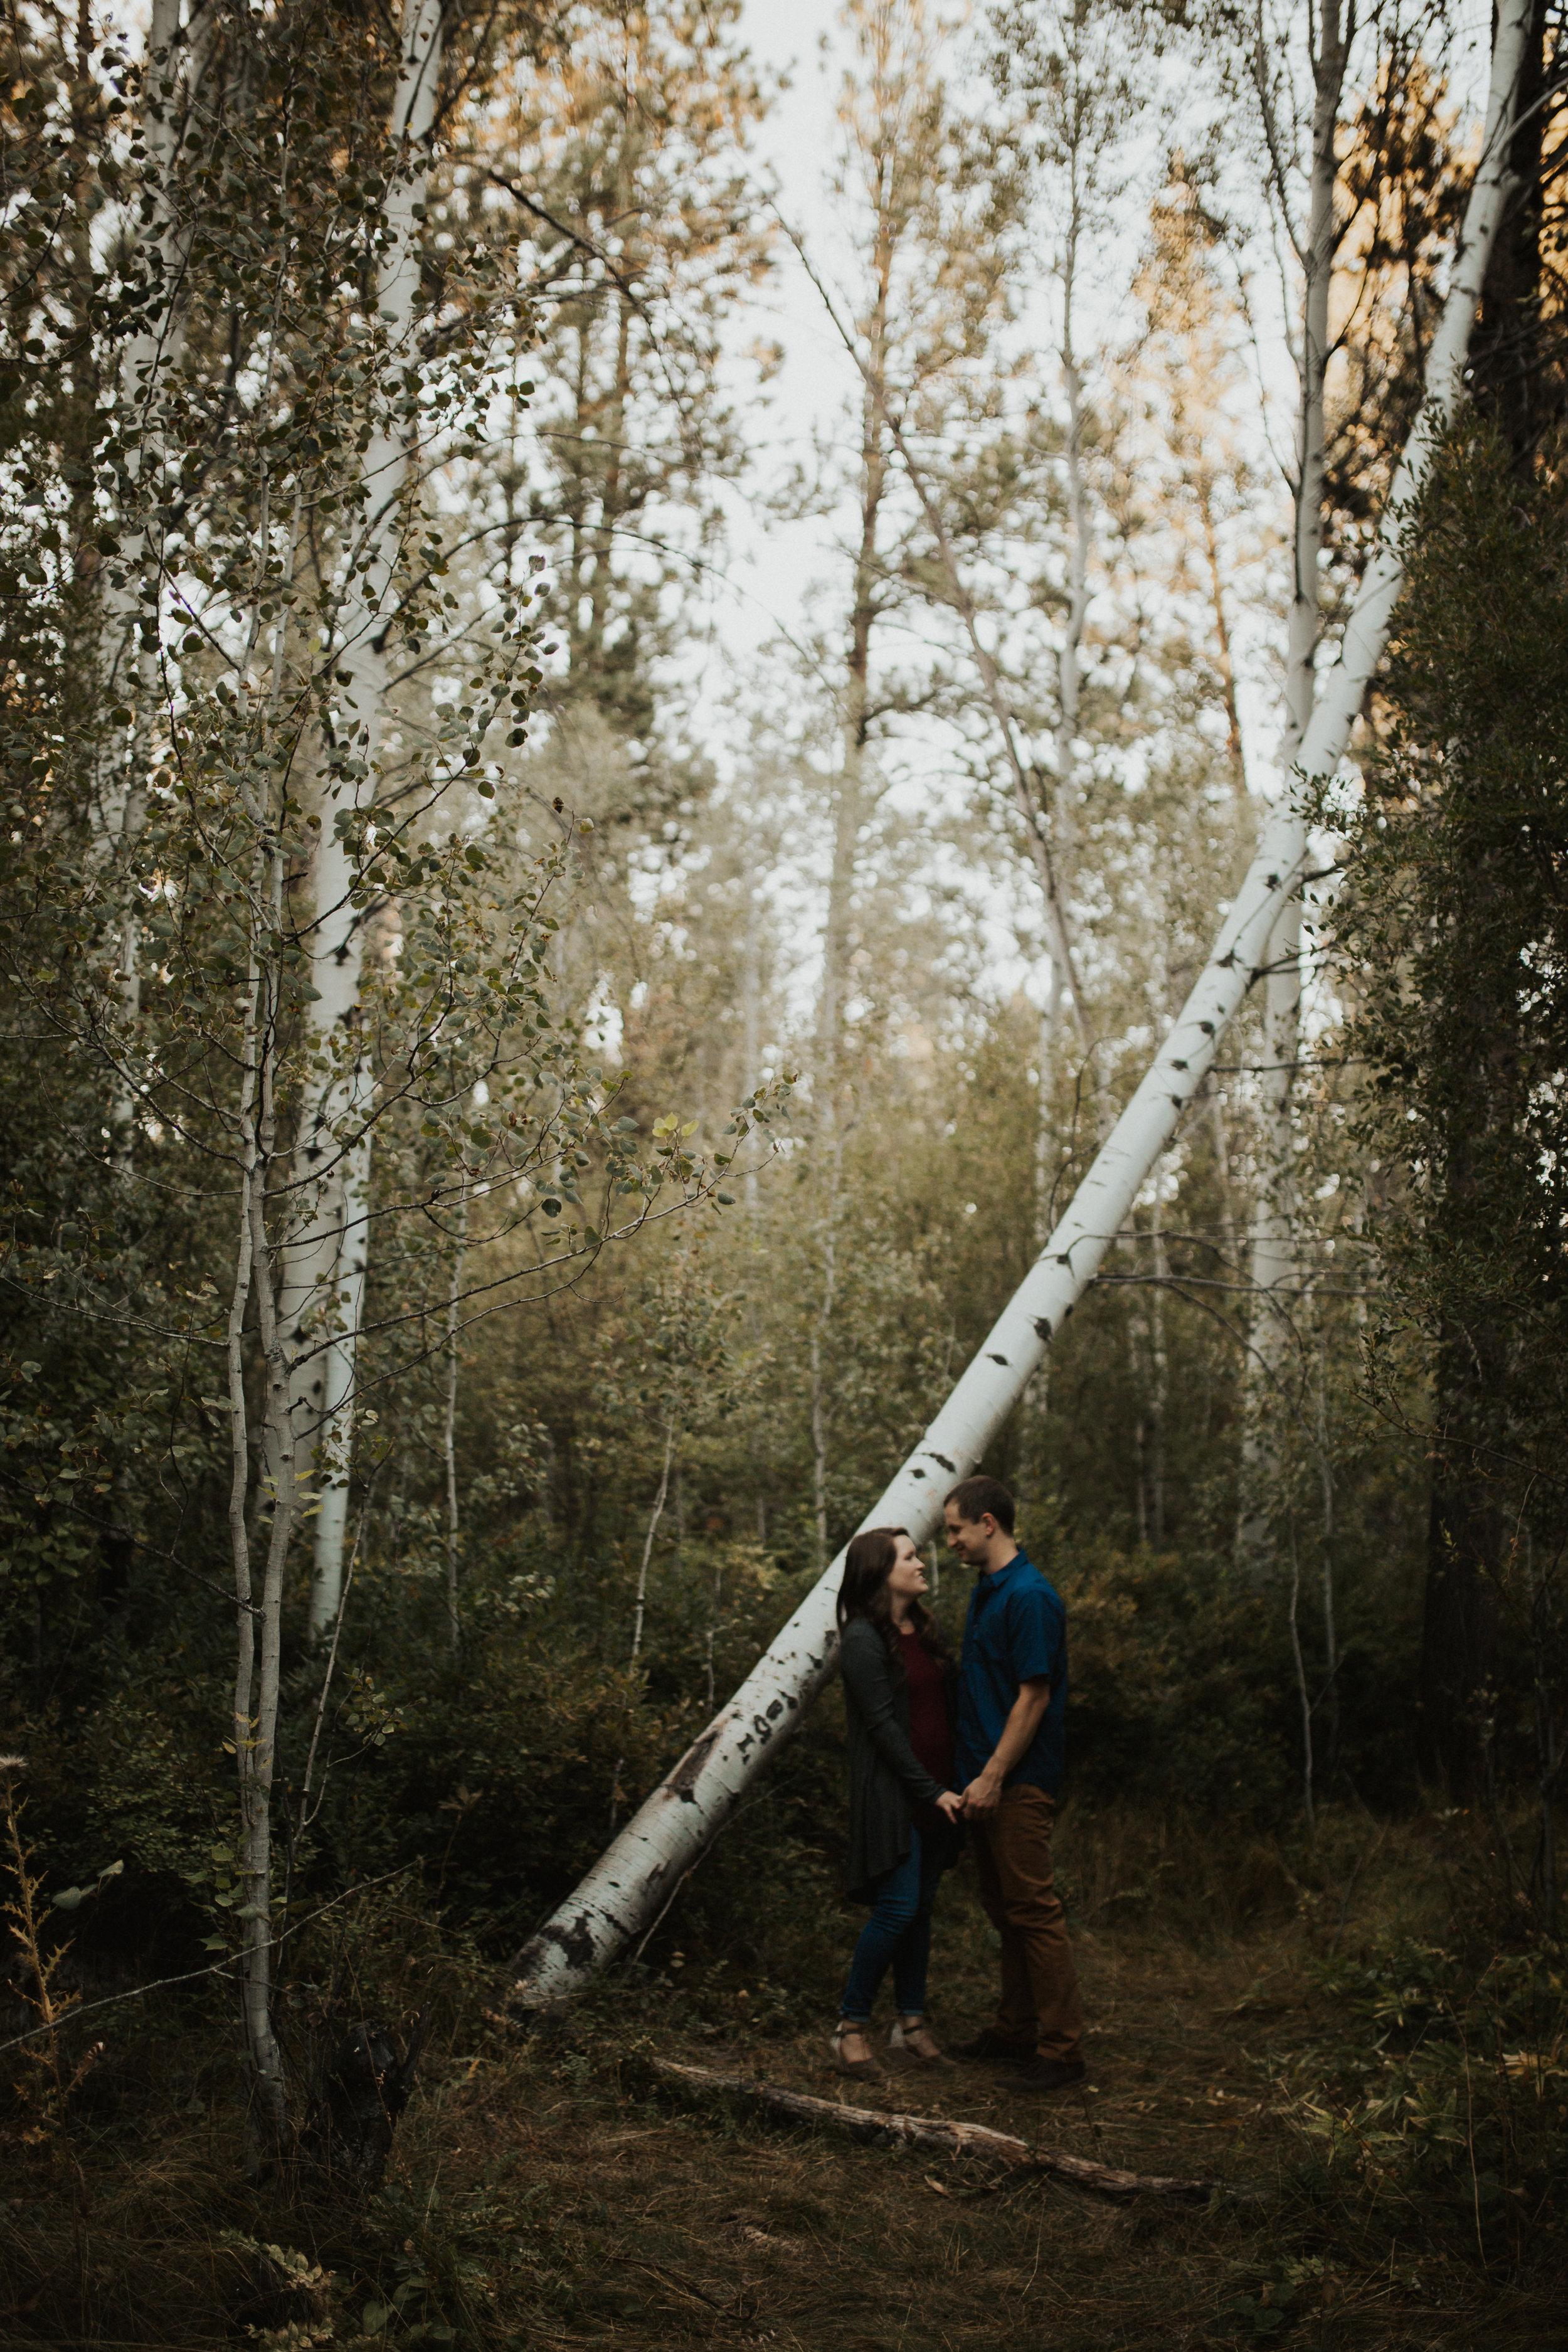 Shevlin Park Engagement Session, Bend Oregon | Rosemary & Pine Photography